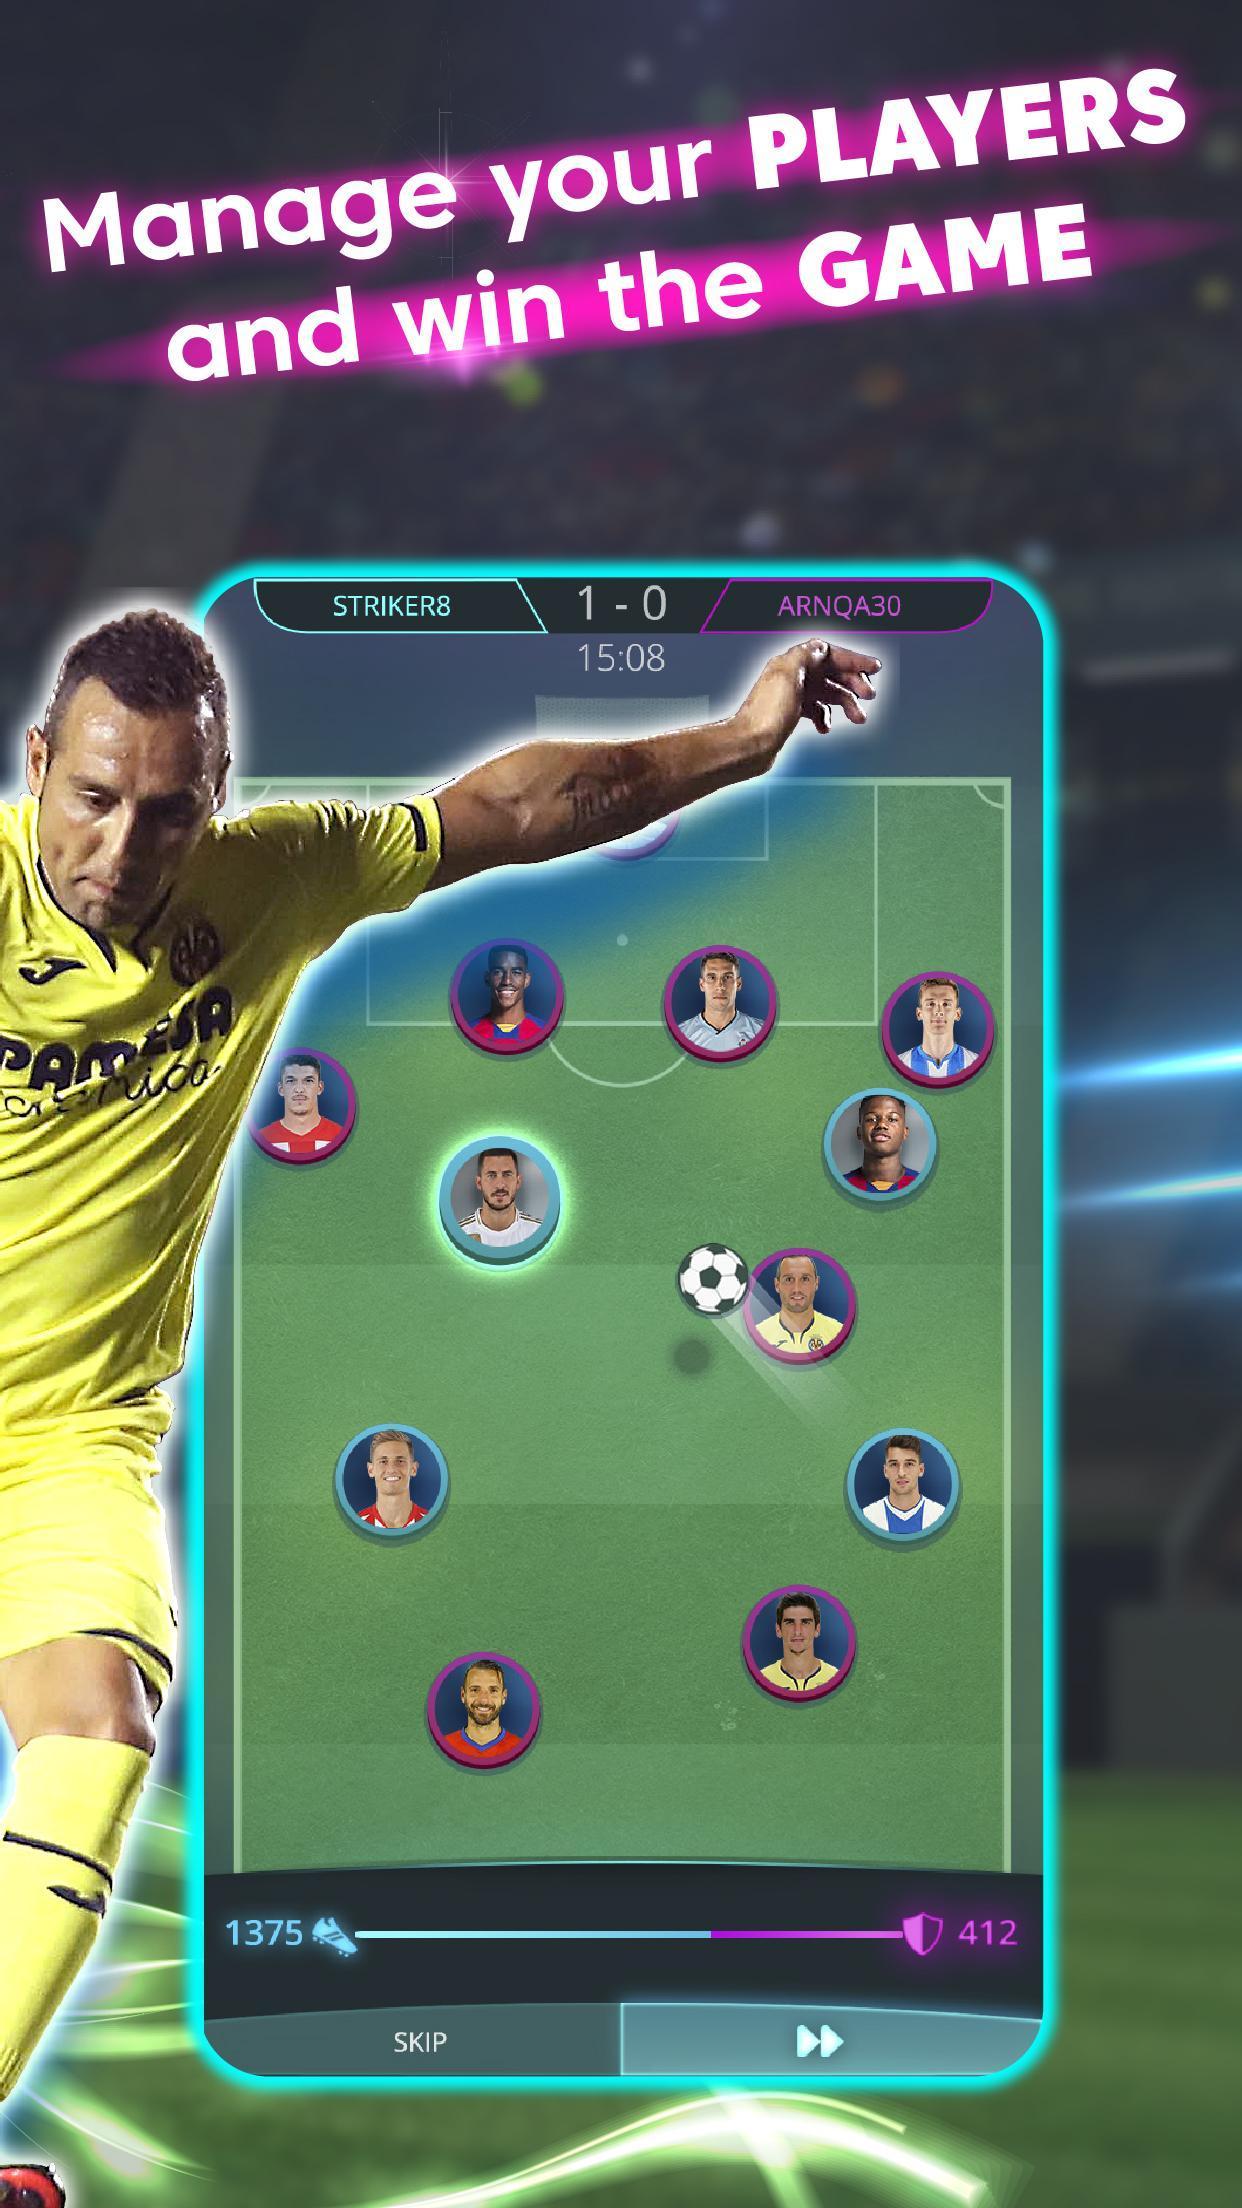 LaLiga Top Cards 2020 - Soccer Card Battle Game 4.1.4 Screenshot 7